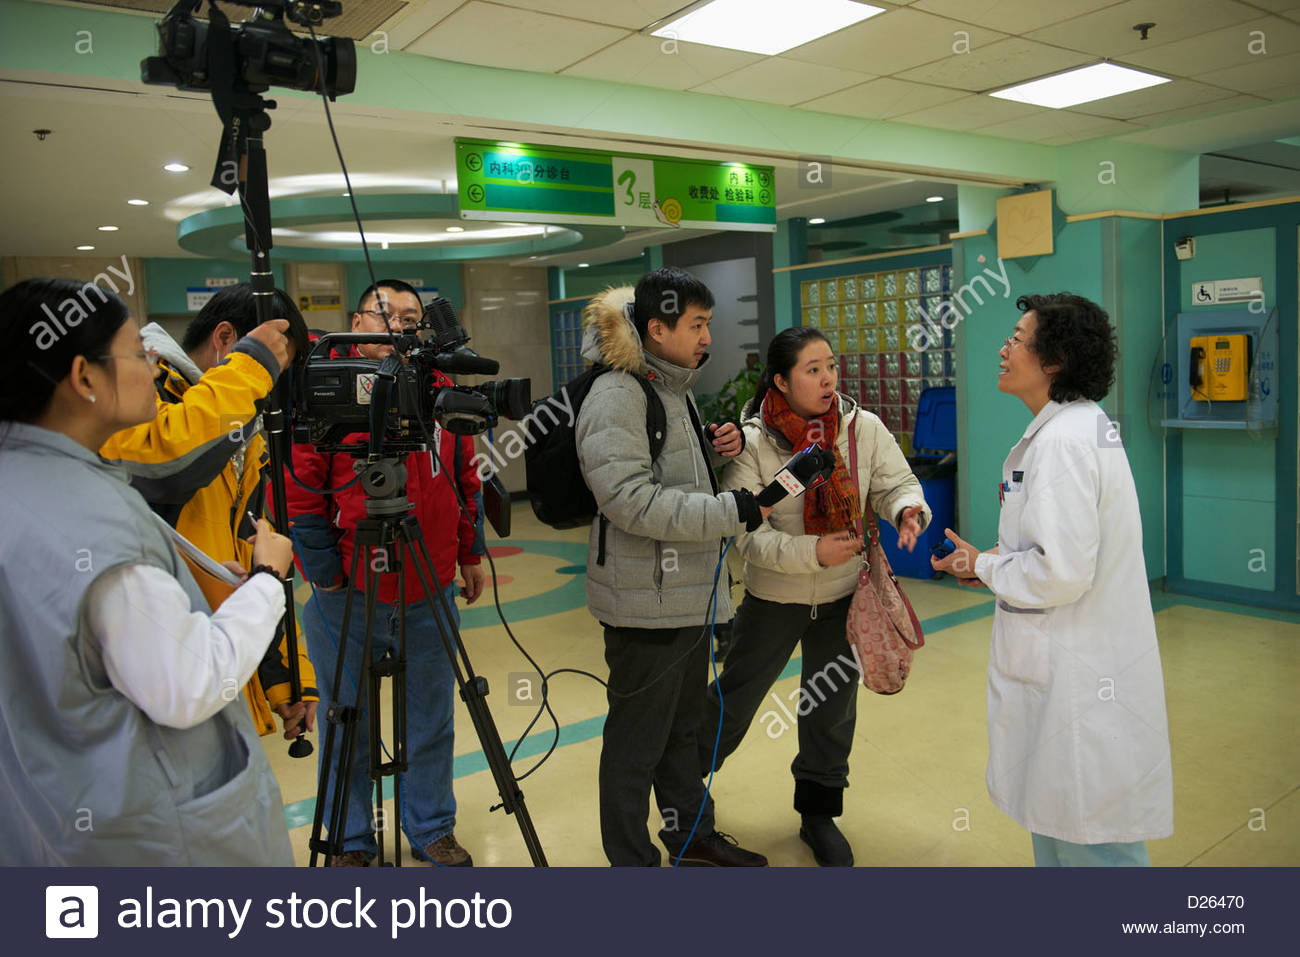 China CCTV interview. 14-Jan-2013 - Stock Image